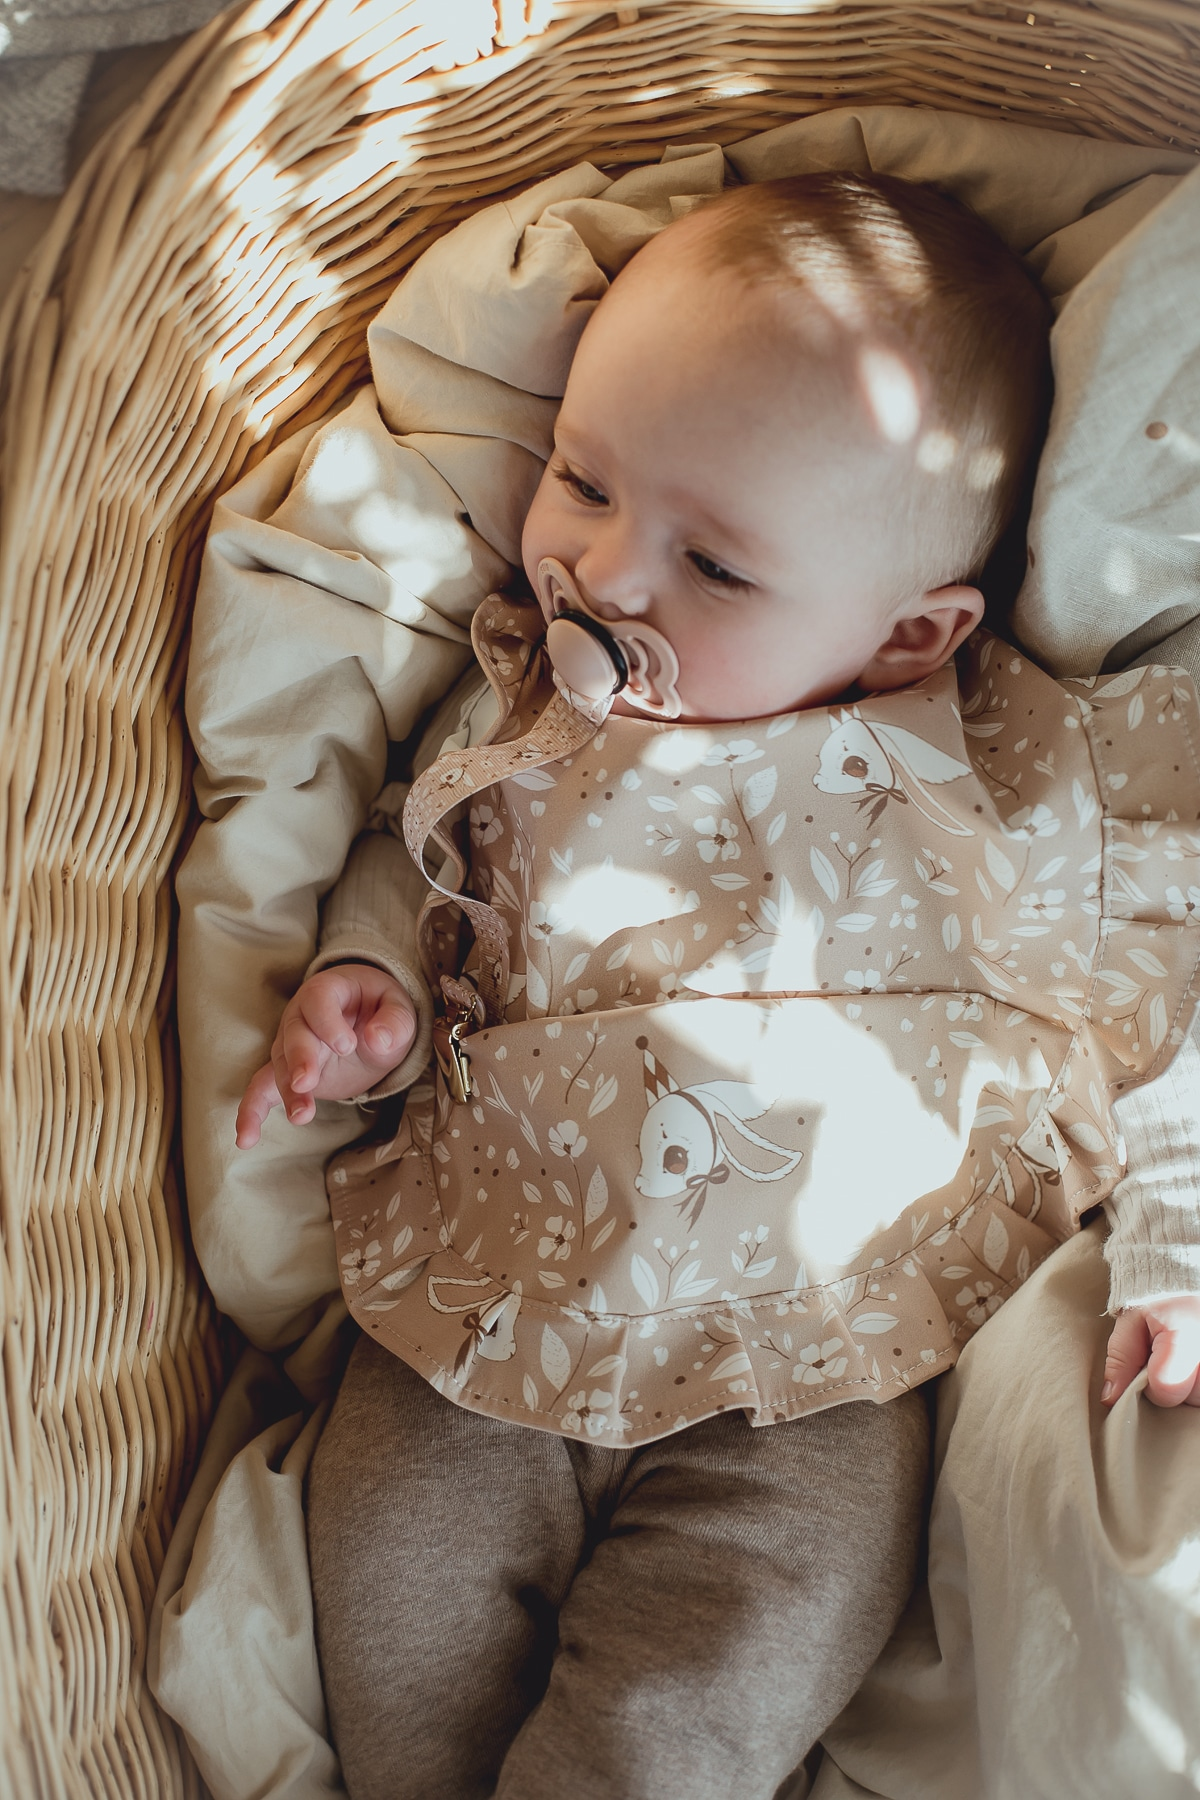 Baby_bib_pink_bunny_Mrs_Mighetto